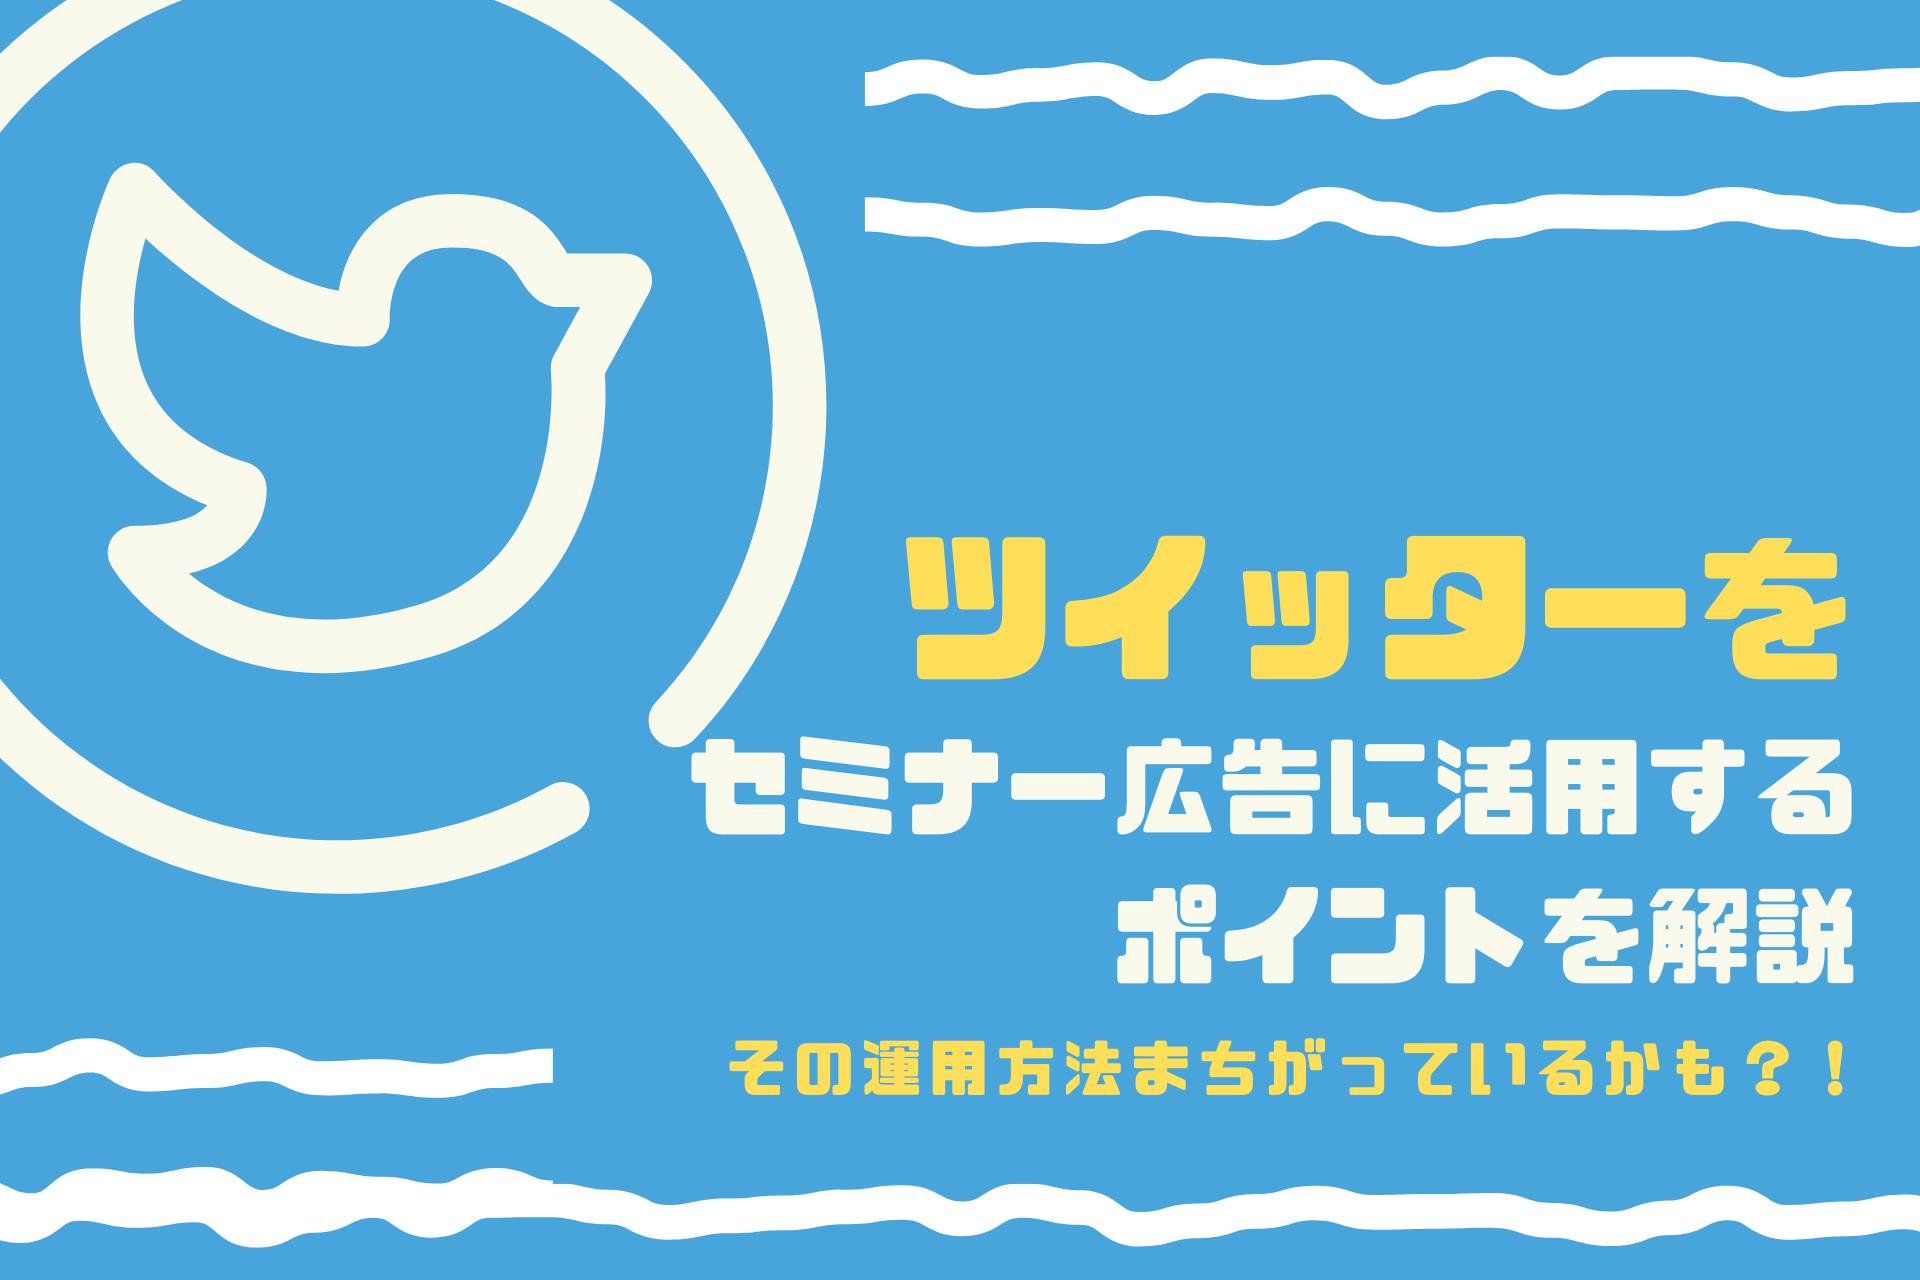 Twitterをセミナーの広告に活用する方法とは?